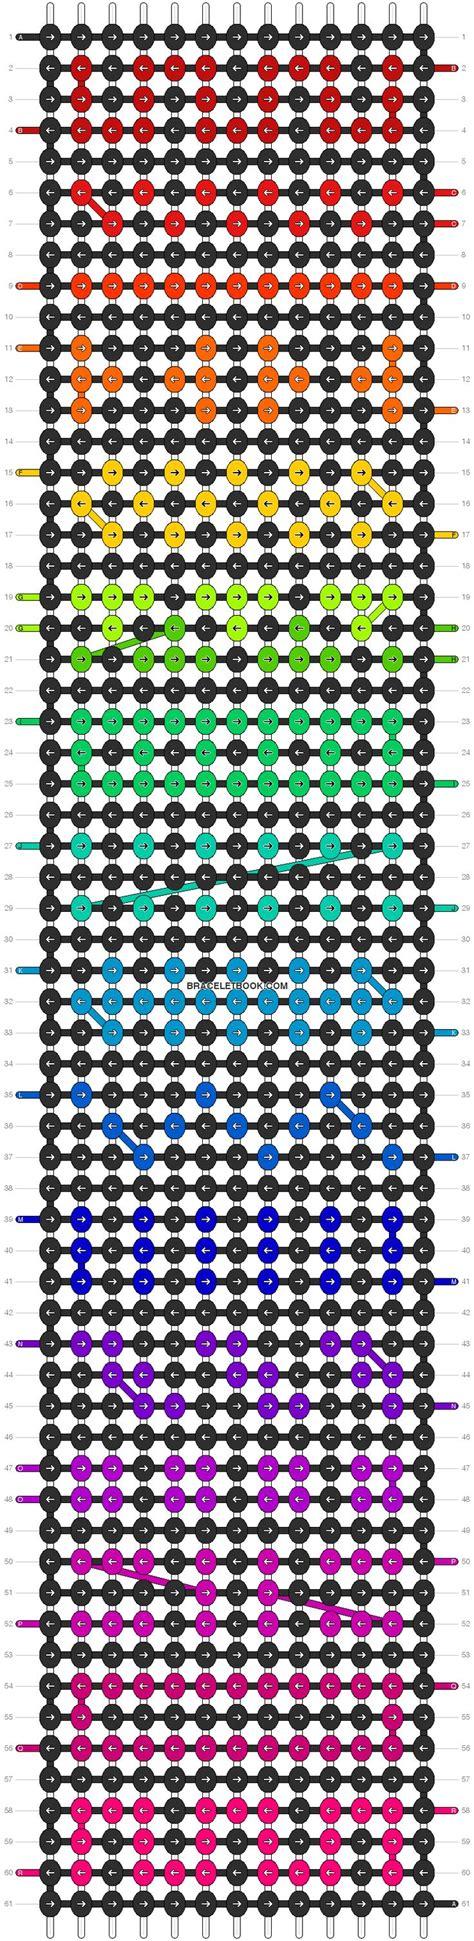 tribal pattern tutorial 17 best images about friendship bracelet patterns on